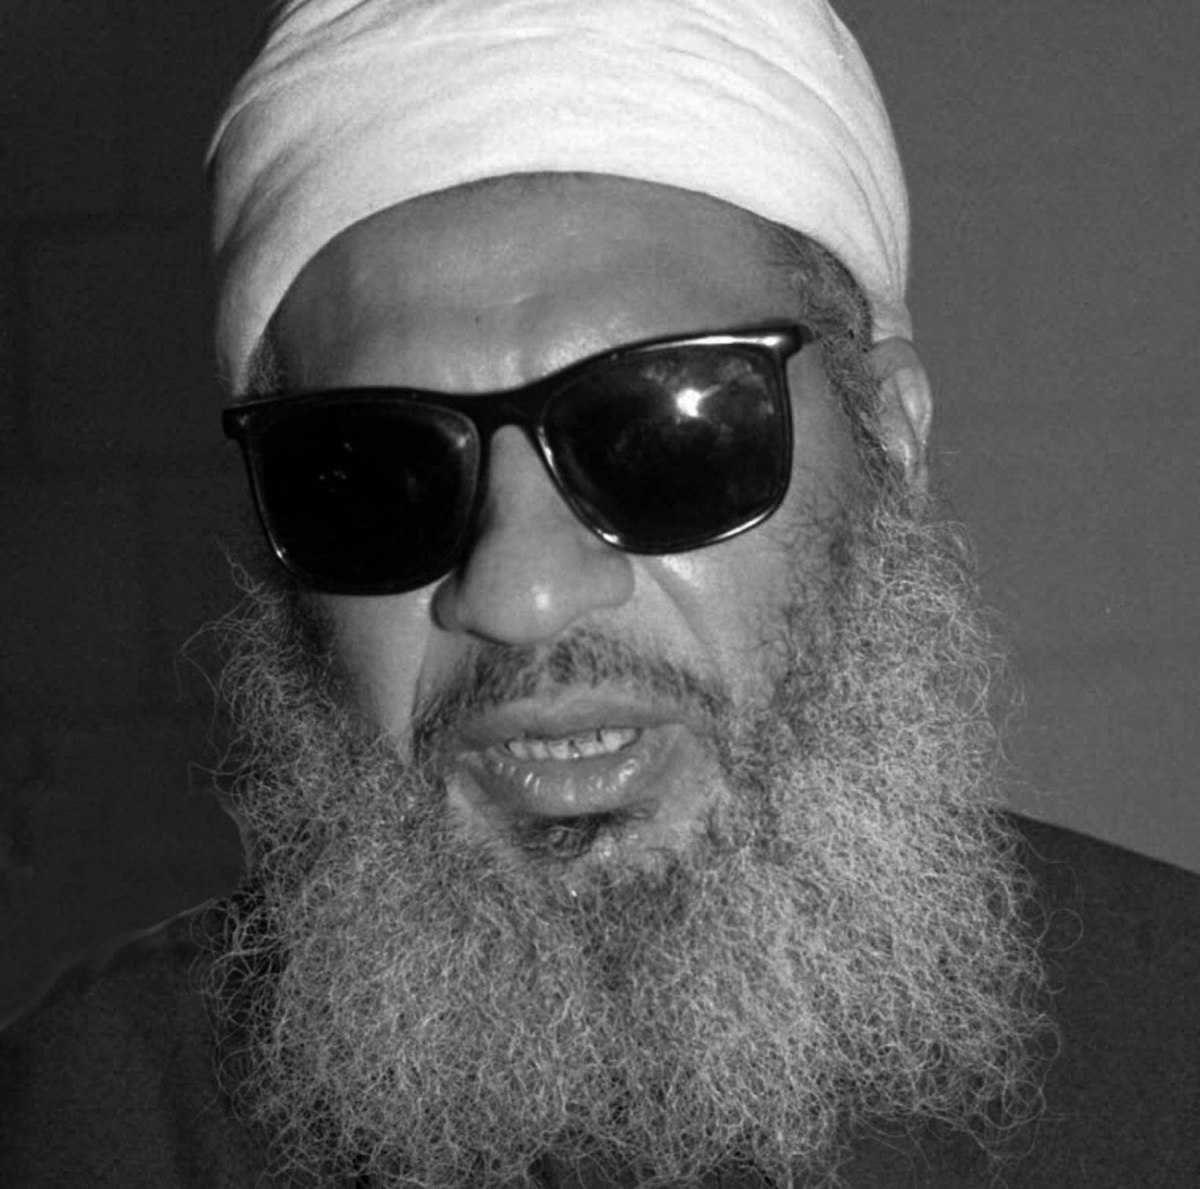 Sunday News -- Omar Abdel Rahman, Brooklyn terrorist theologian dies in prison